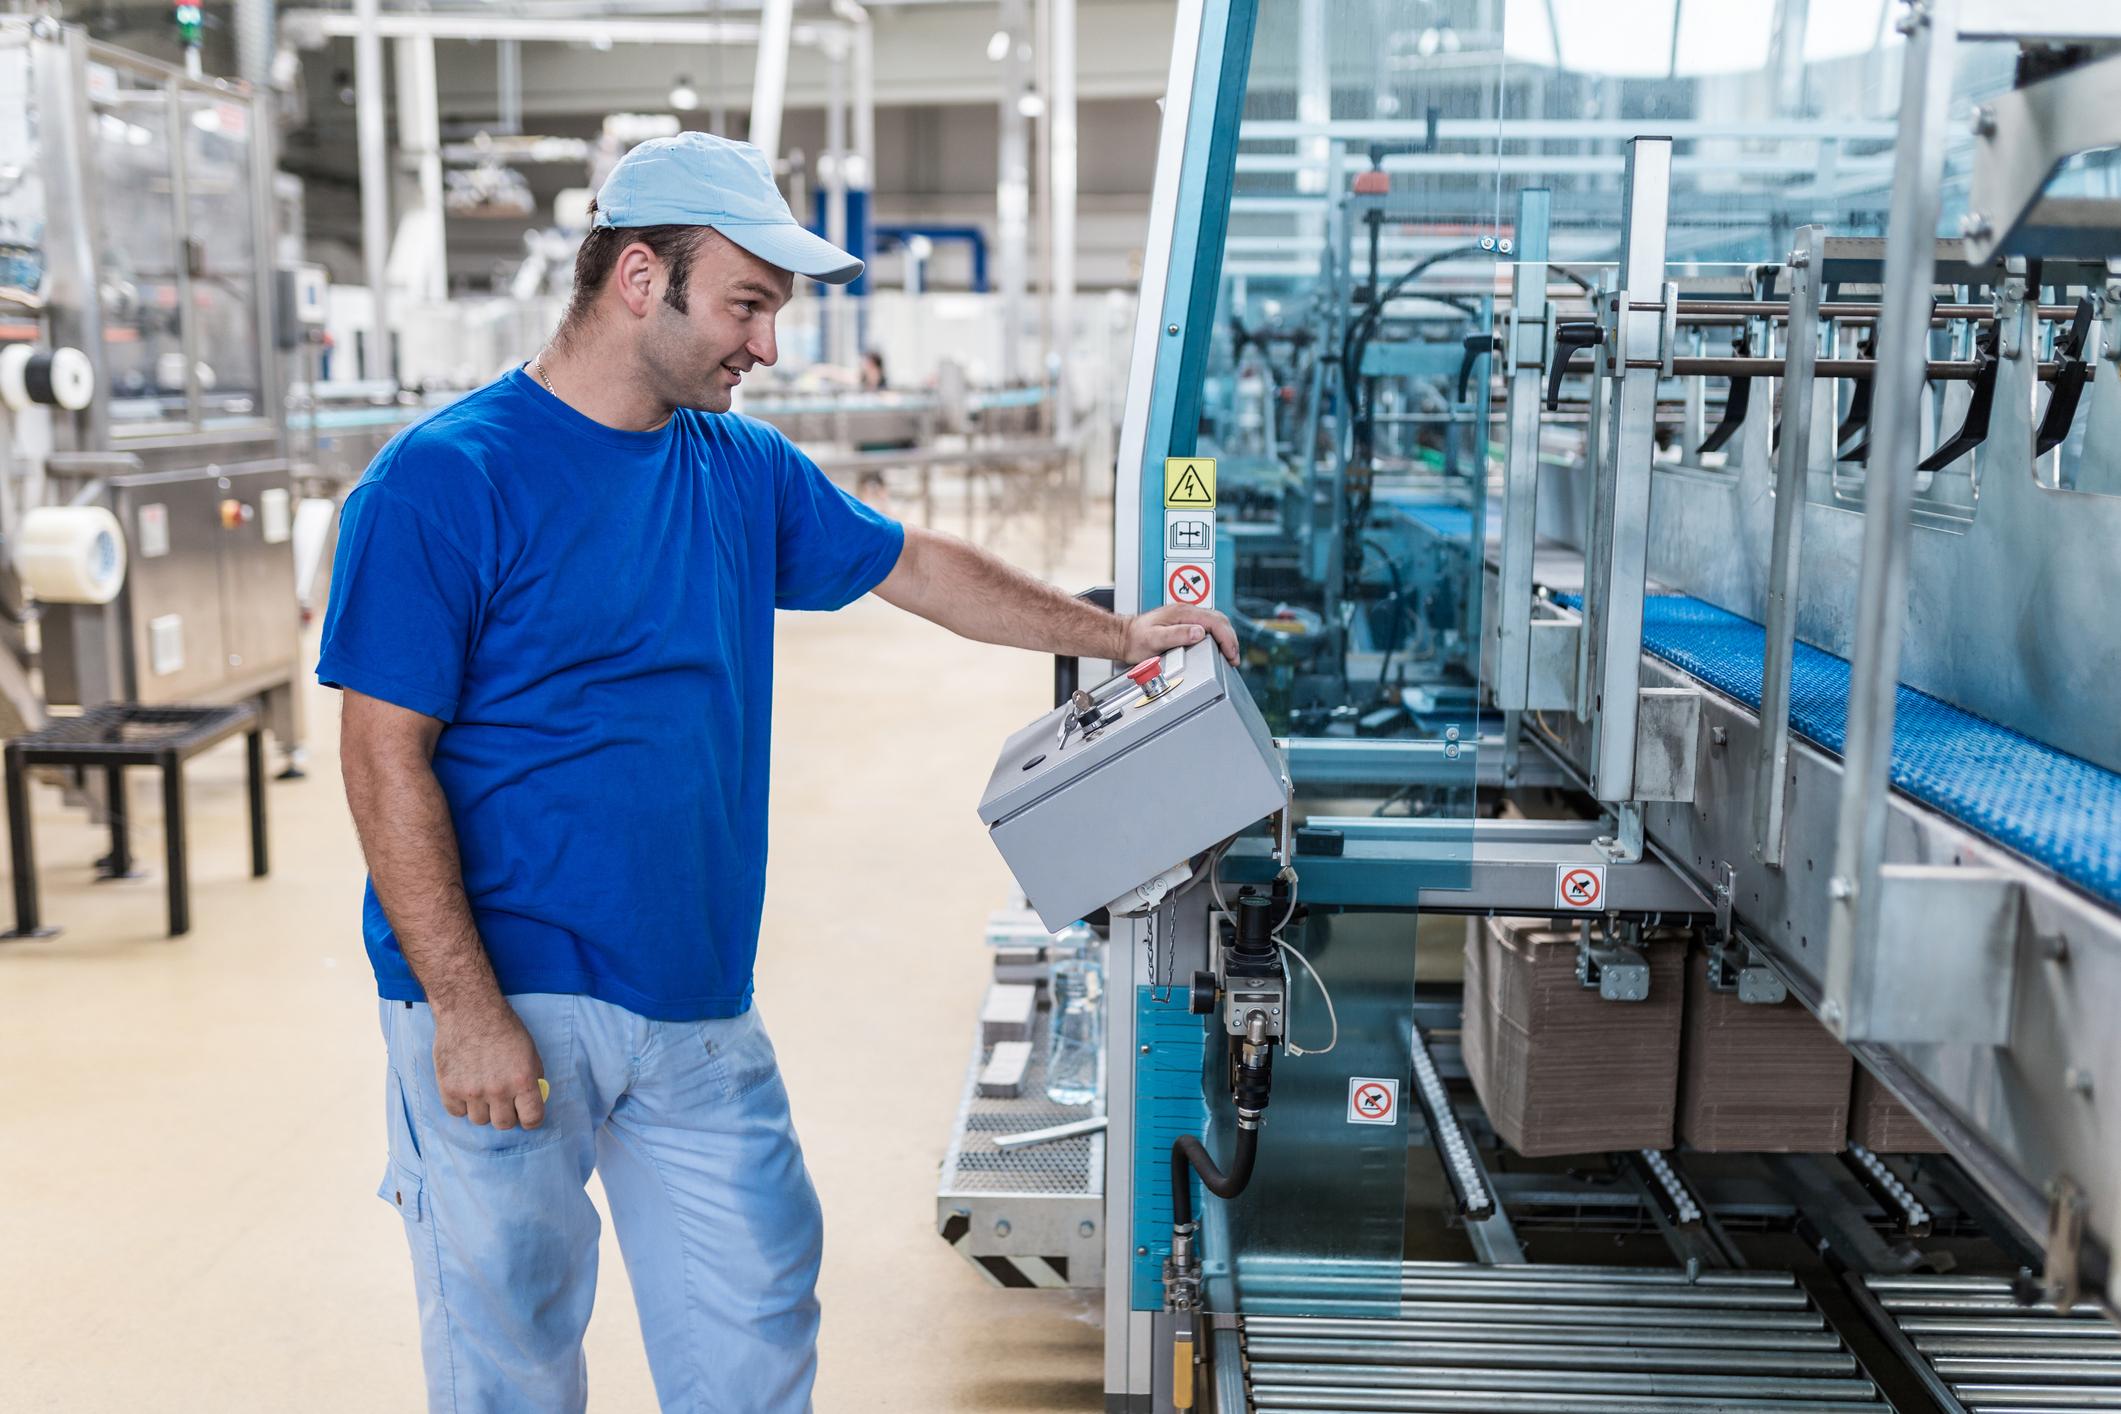 top-key-characteristics-of-smb-manufacturers-part-1